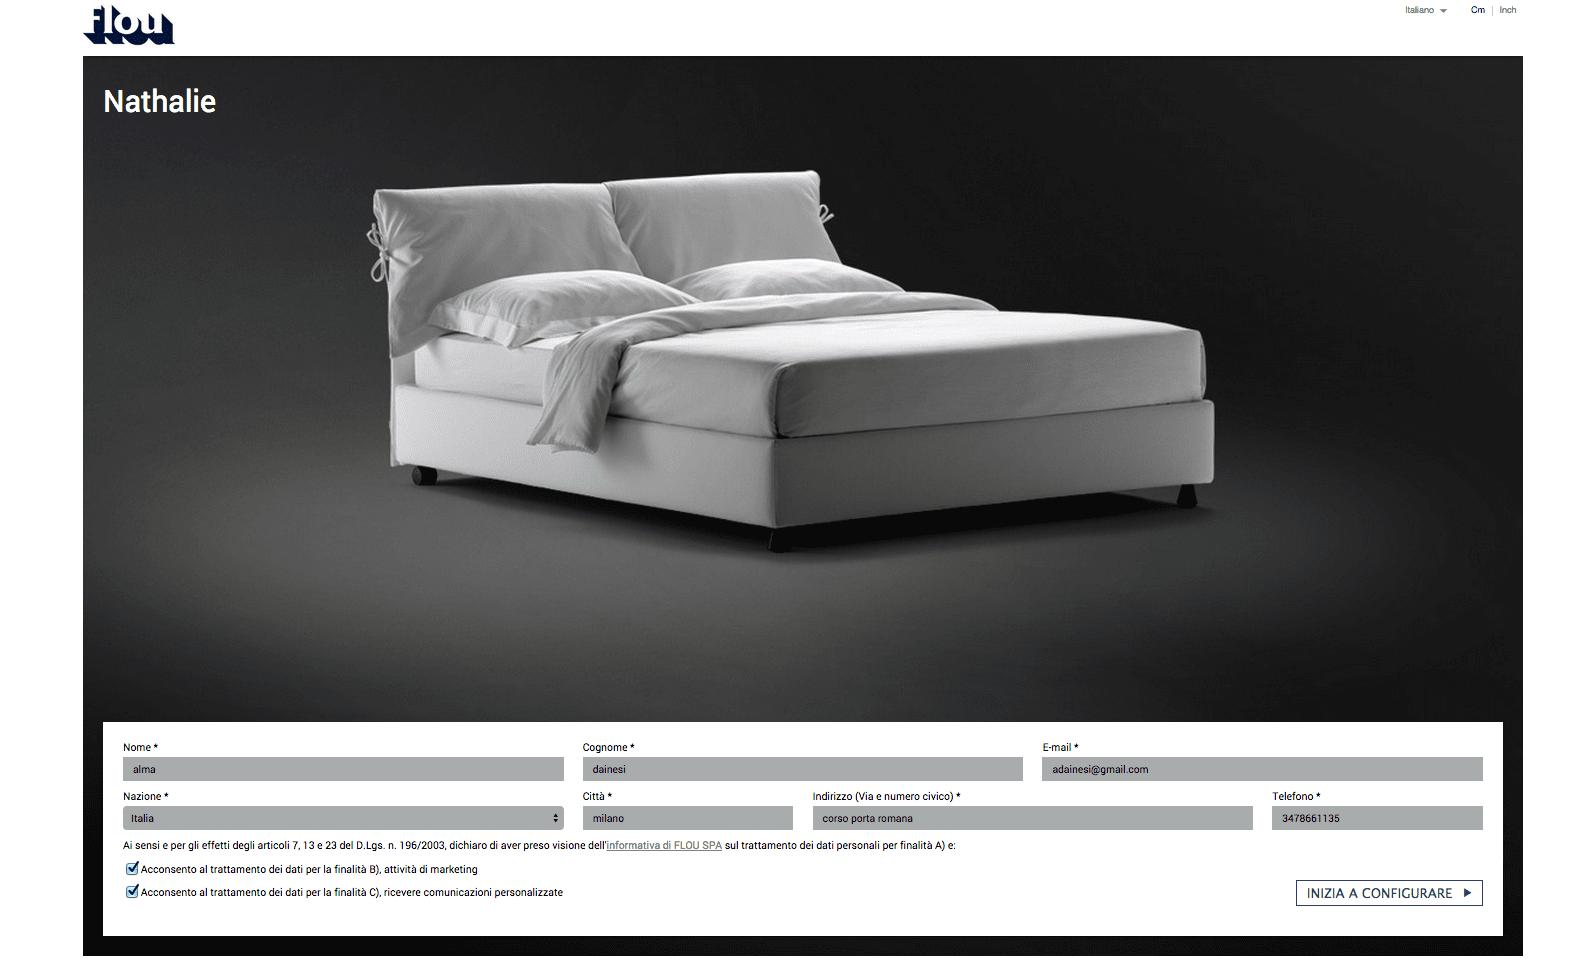 Flou tadao prezzo cheap letto olivier flou with letto notturno flou prezzo with flou tadao - Letto duetto flou prezzo ...